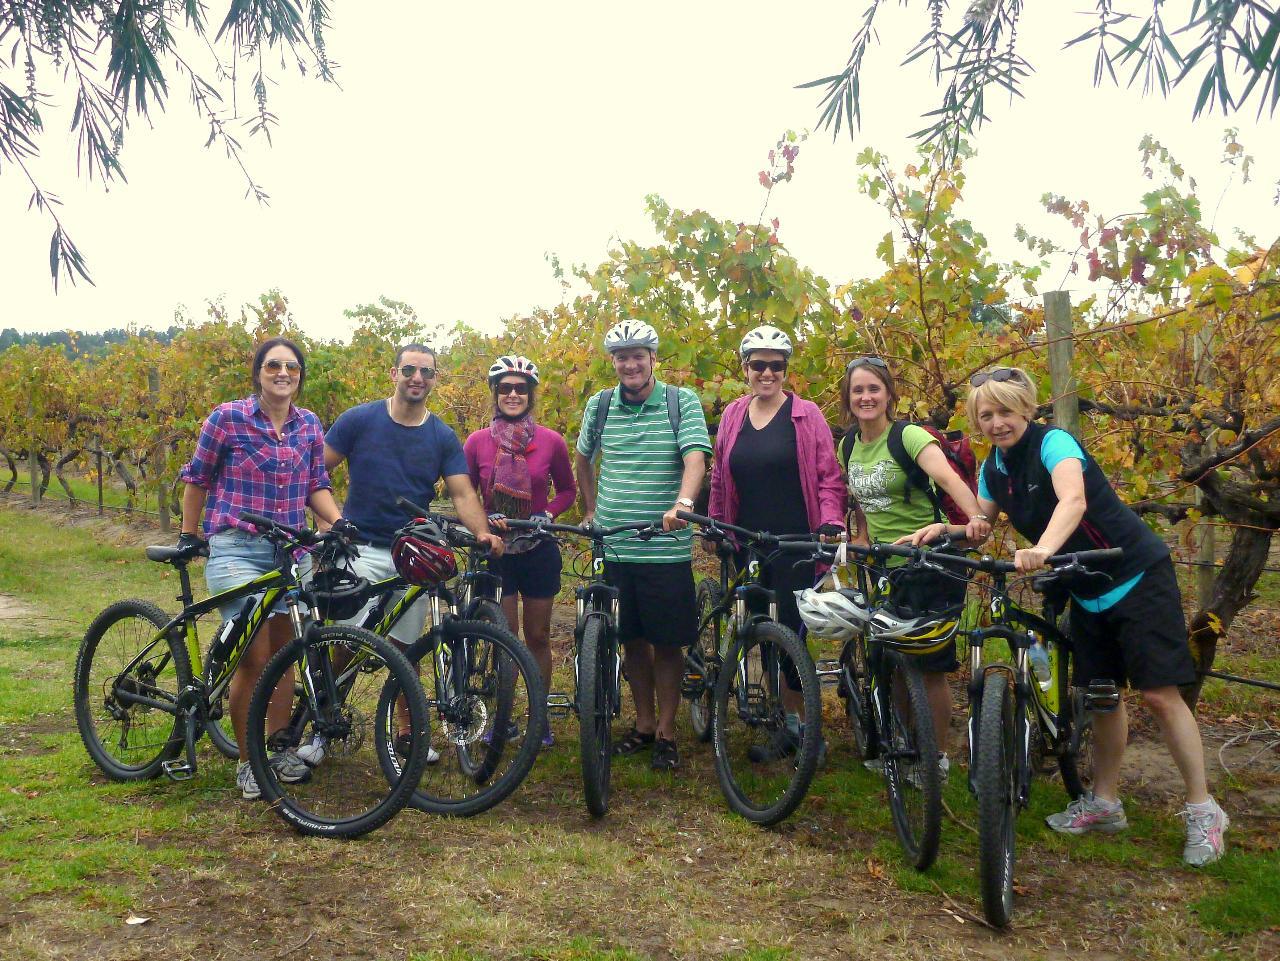 Mclaren Vale bike and wine gift voucher